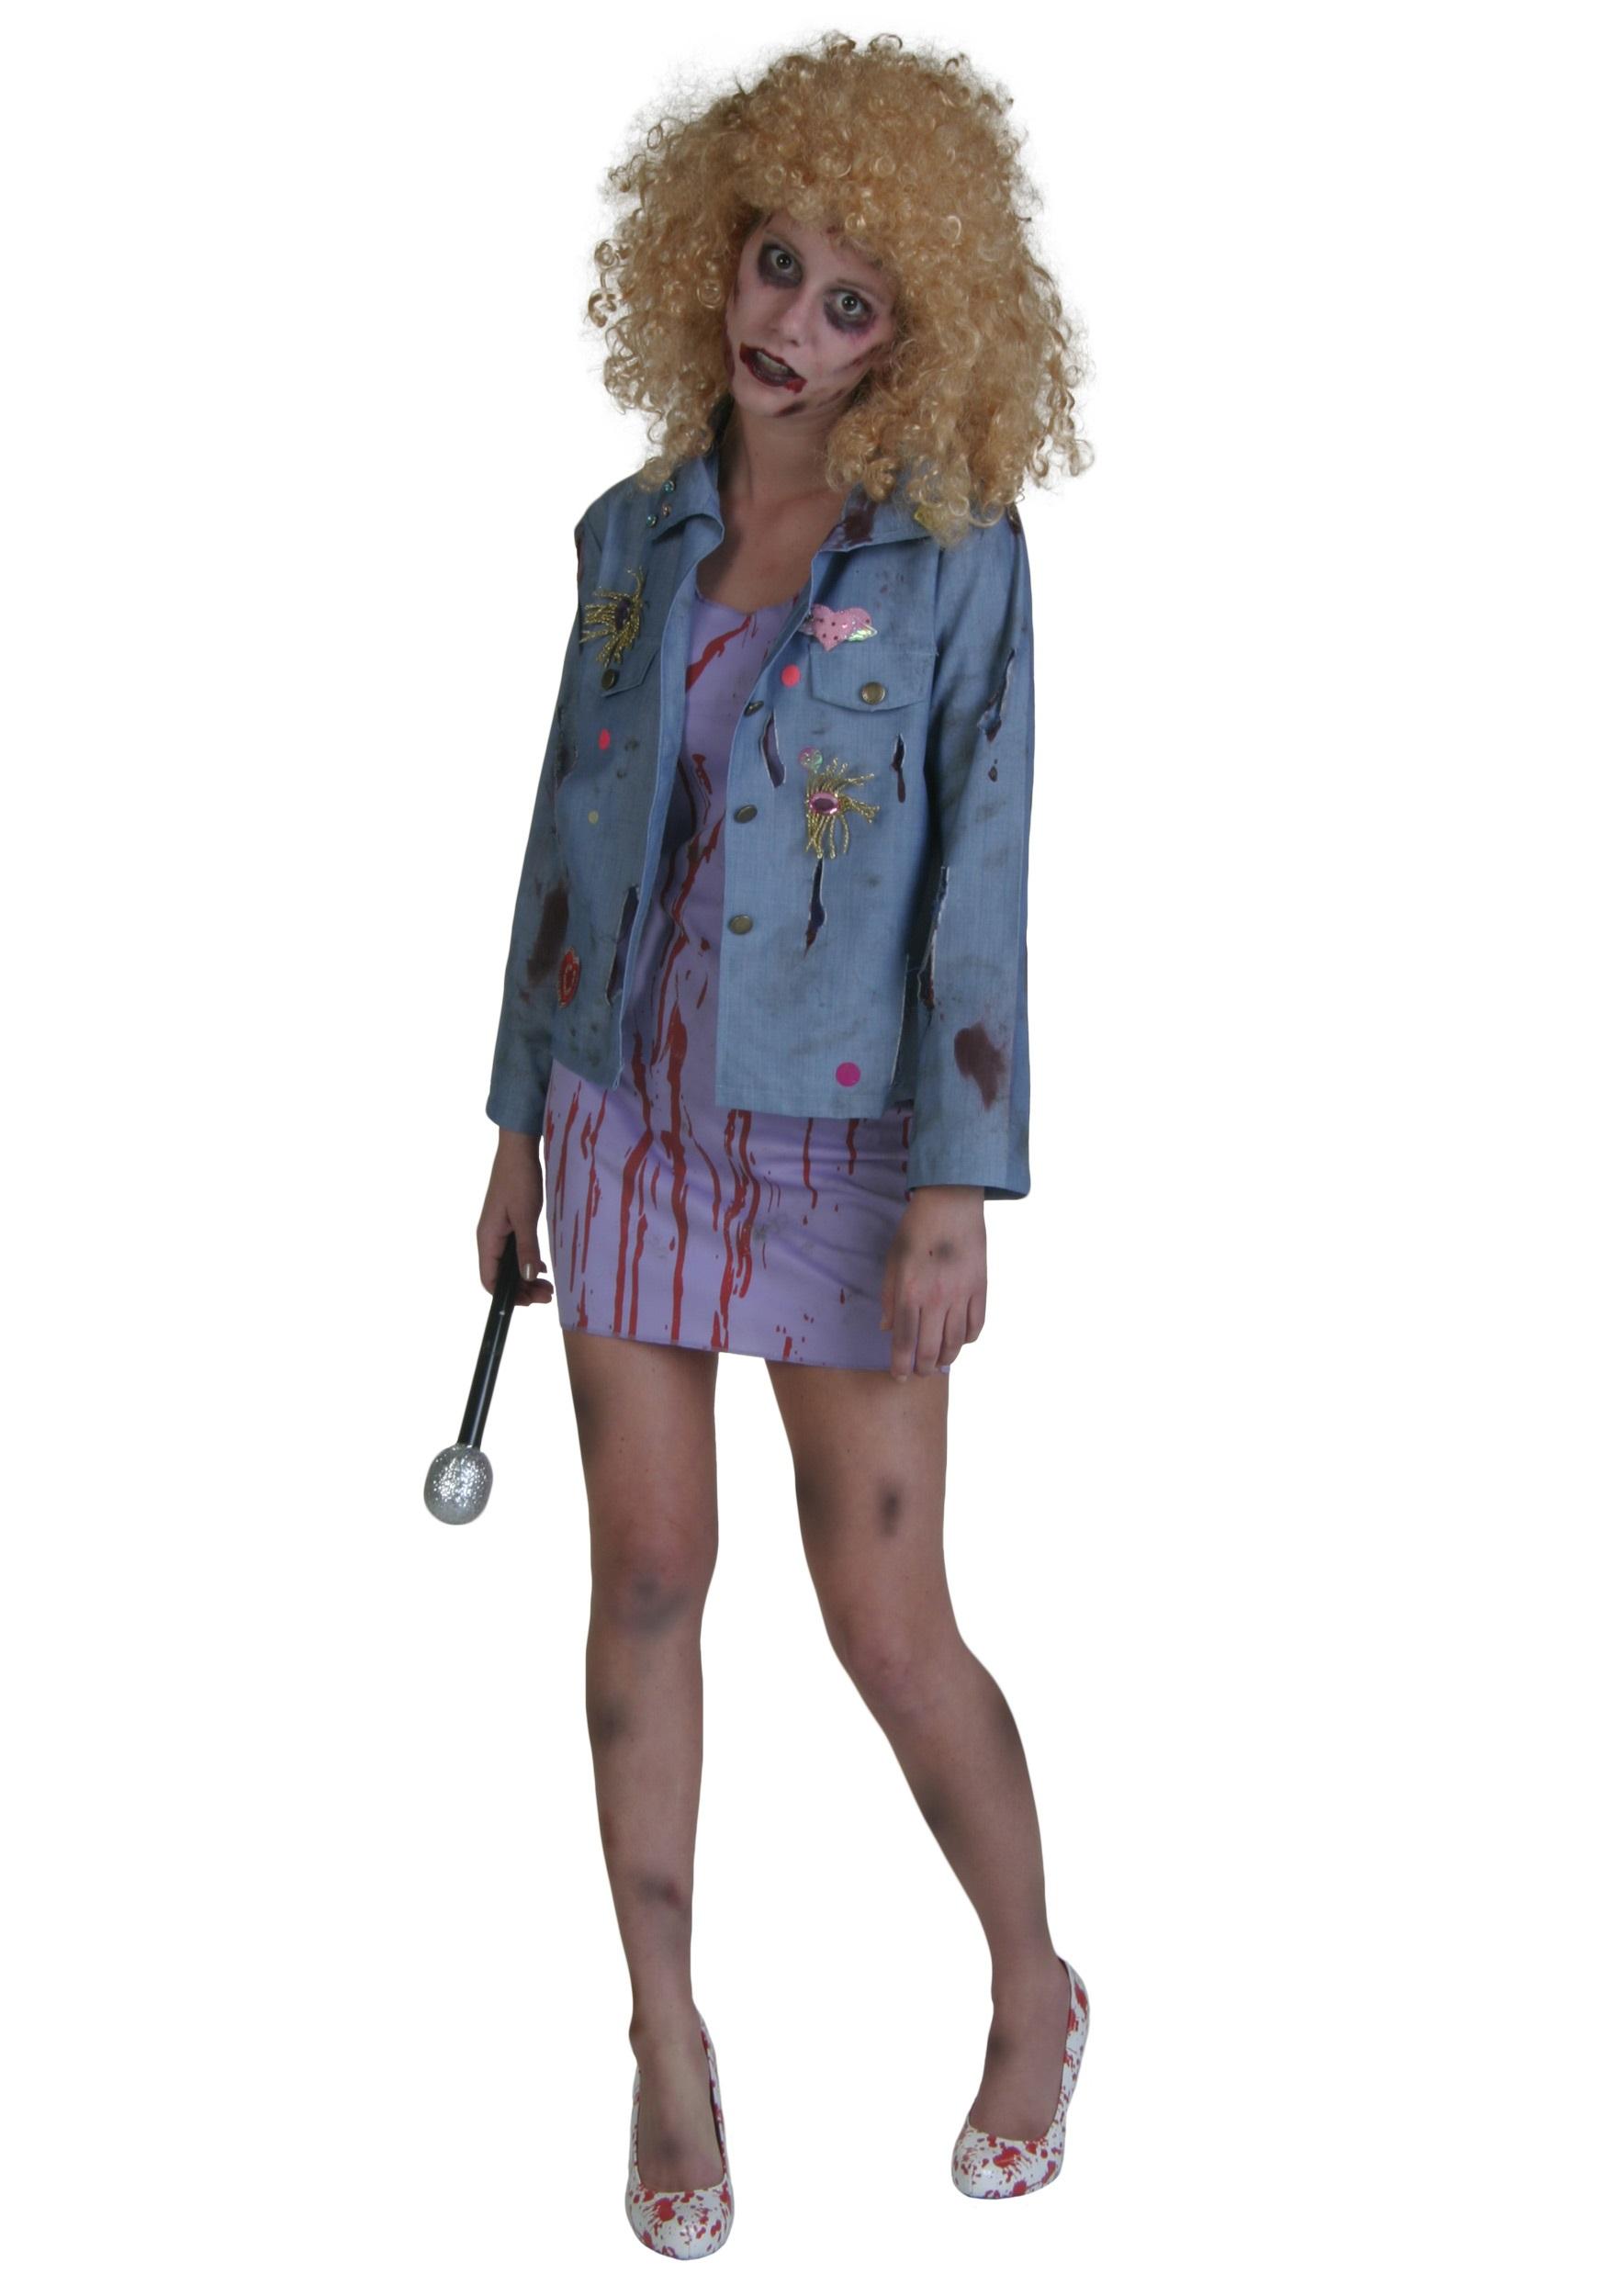 Zombie Soul Singer Costume  sc 1 st  Halloween Costumes & Zombie Soul Singer Costume - Halloween Costumes